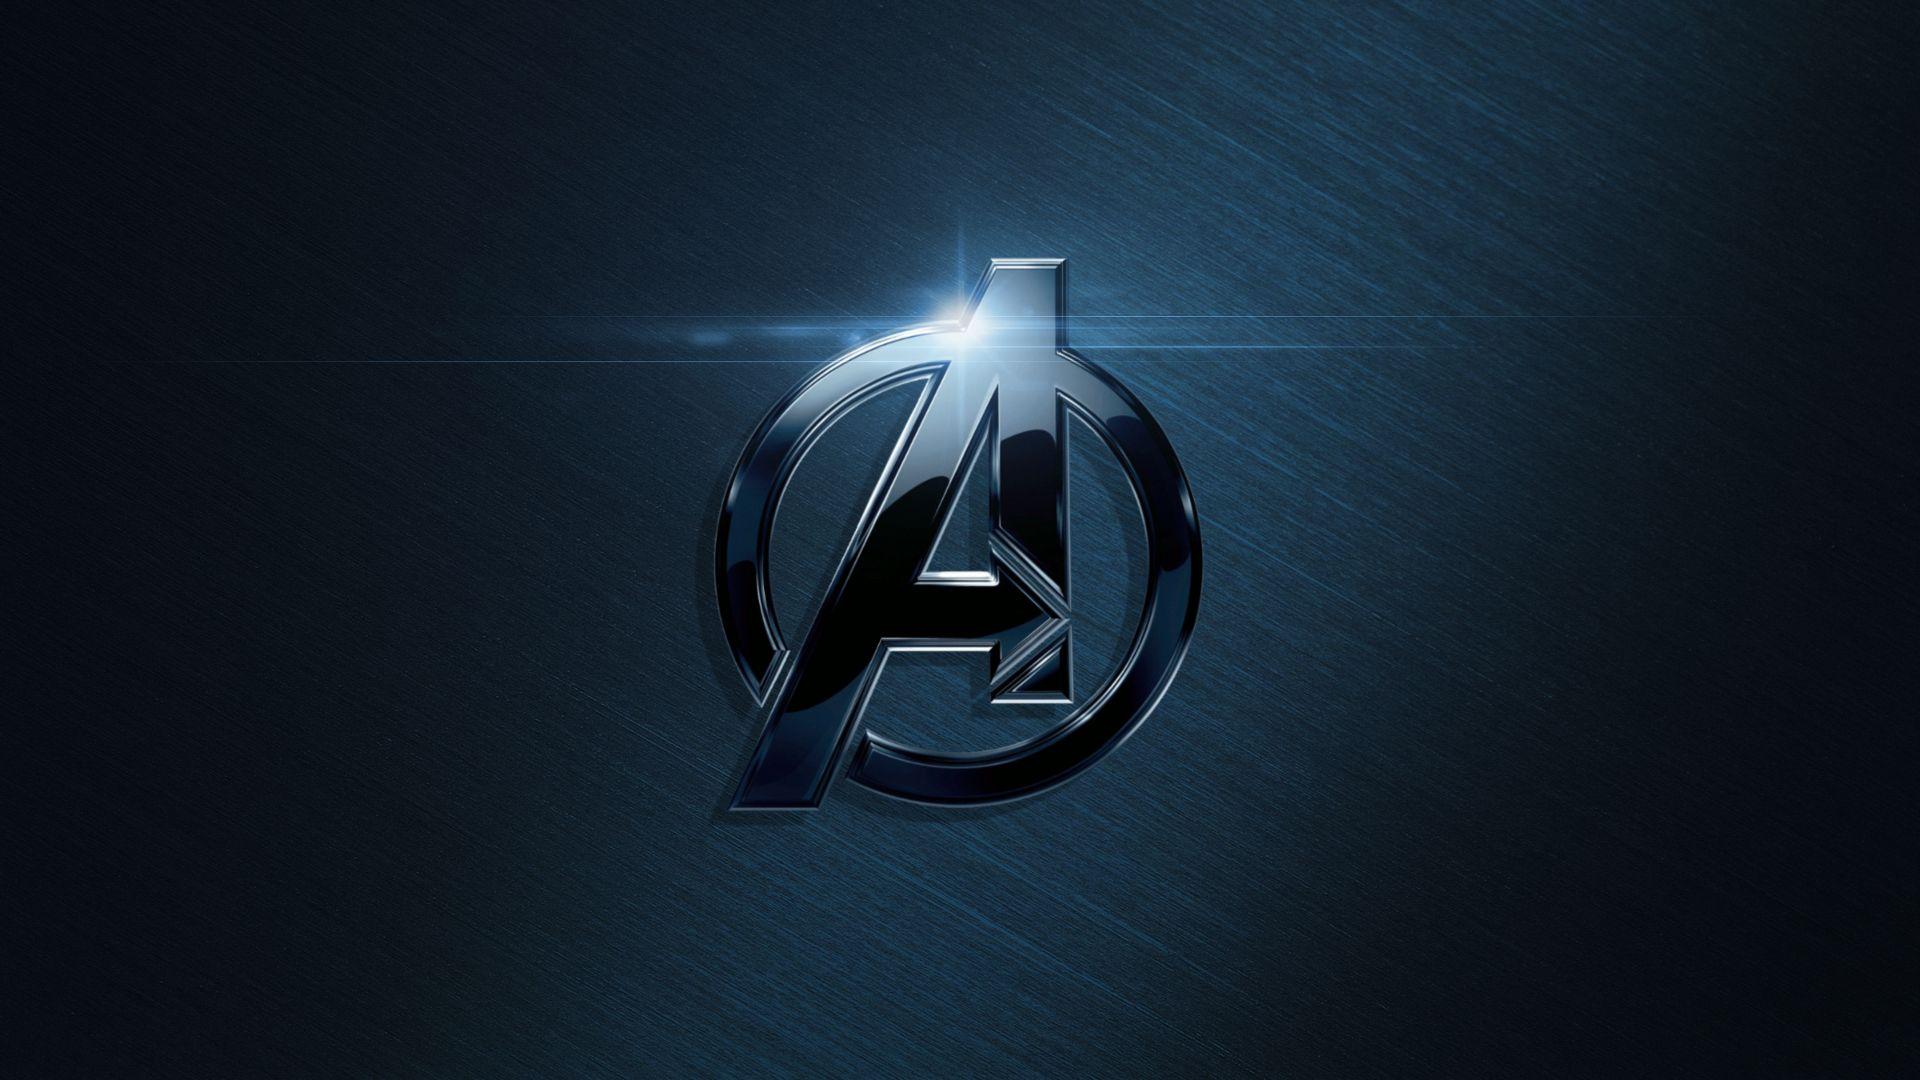 The Avengers Wallpapers, Movie, Best HD 1080p 17 | My nerd is showing | Avengers wallpaper, Hero ...